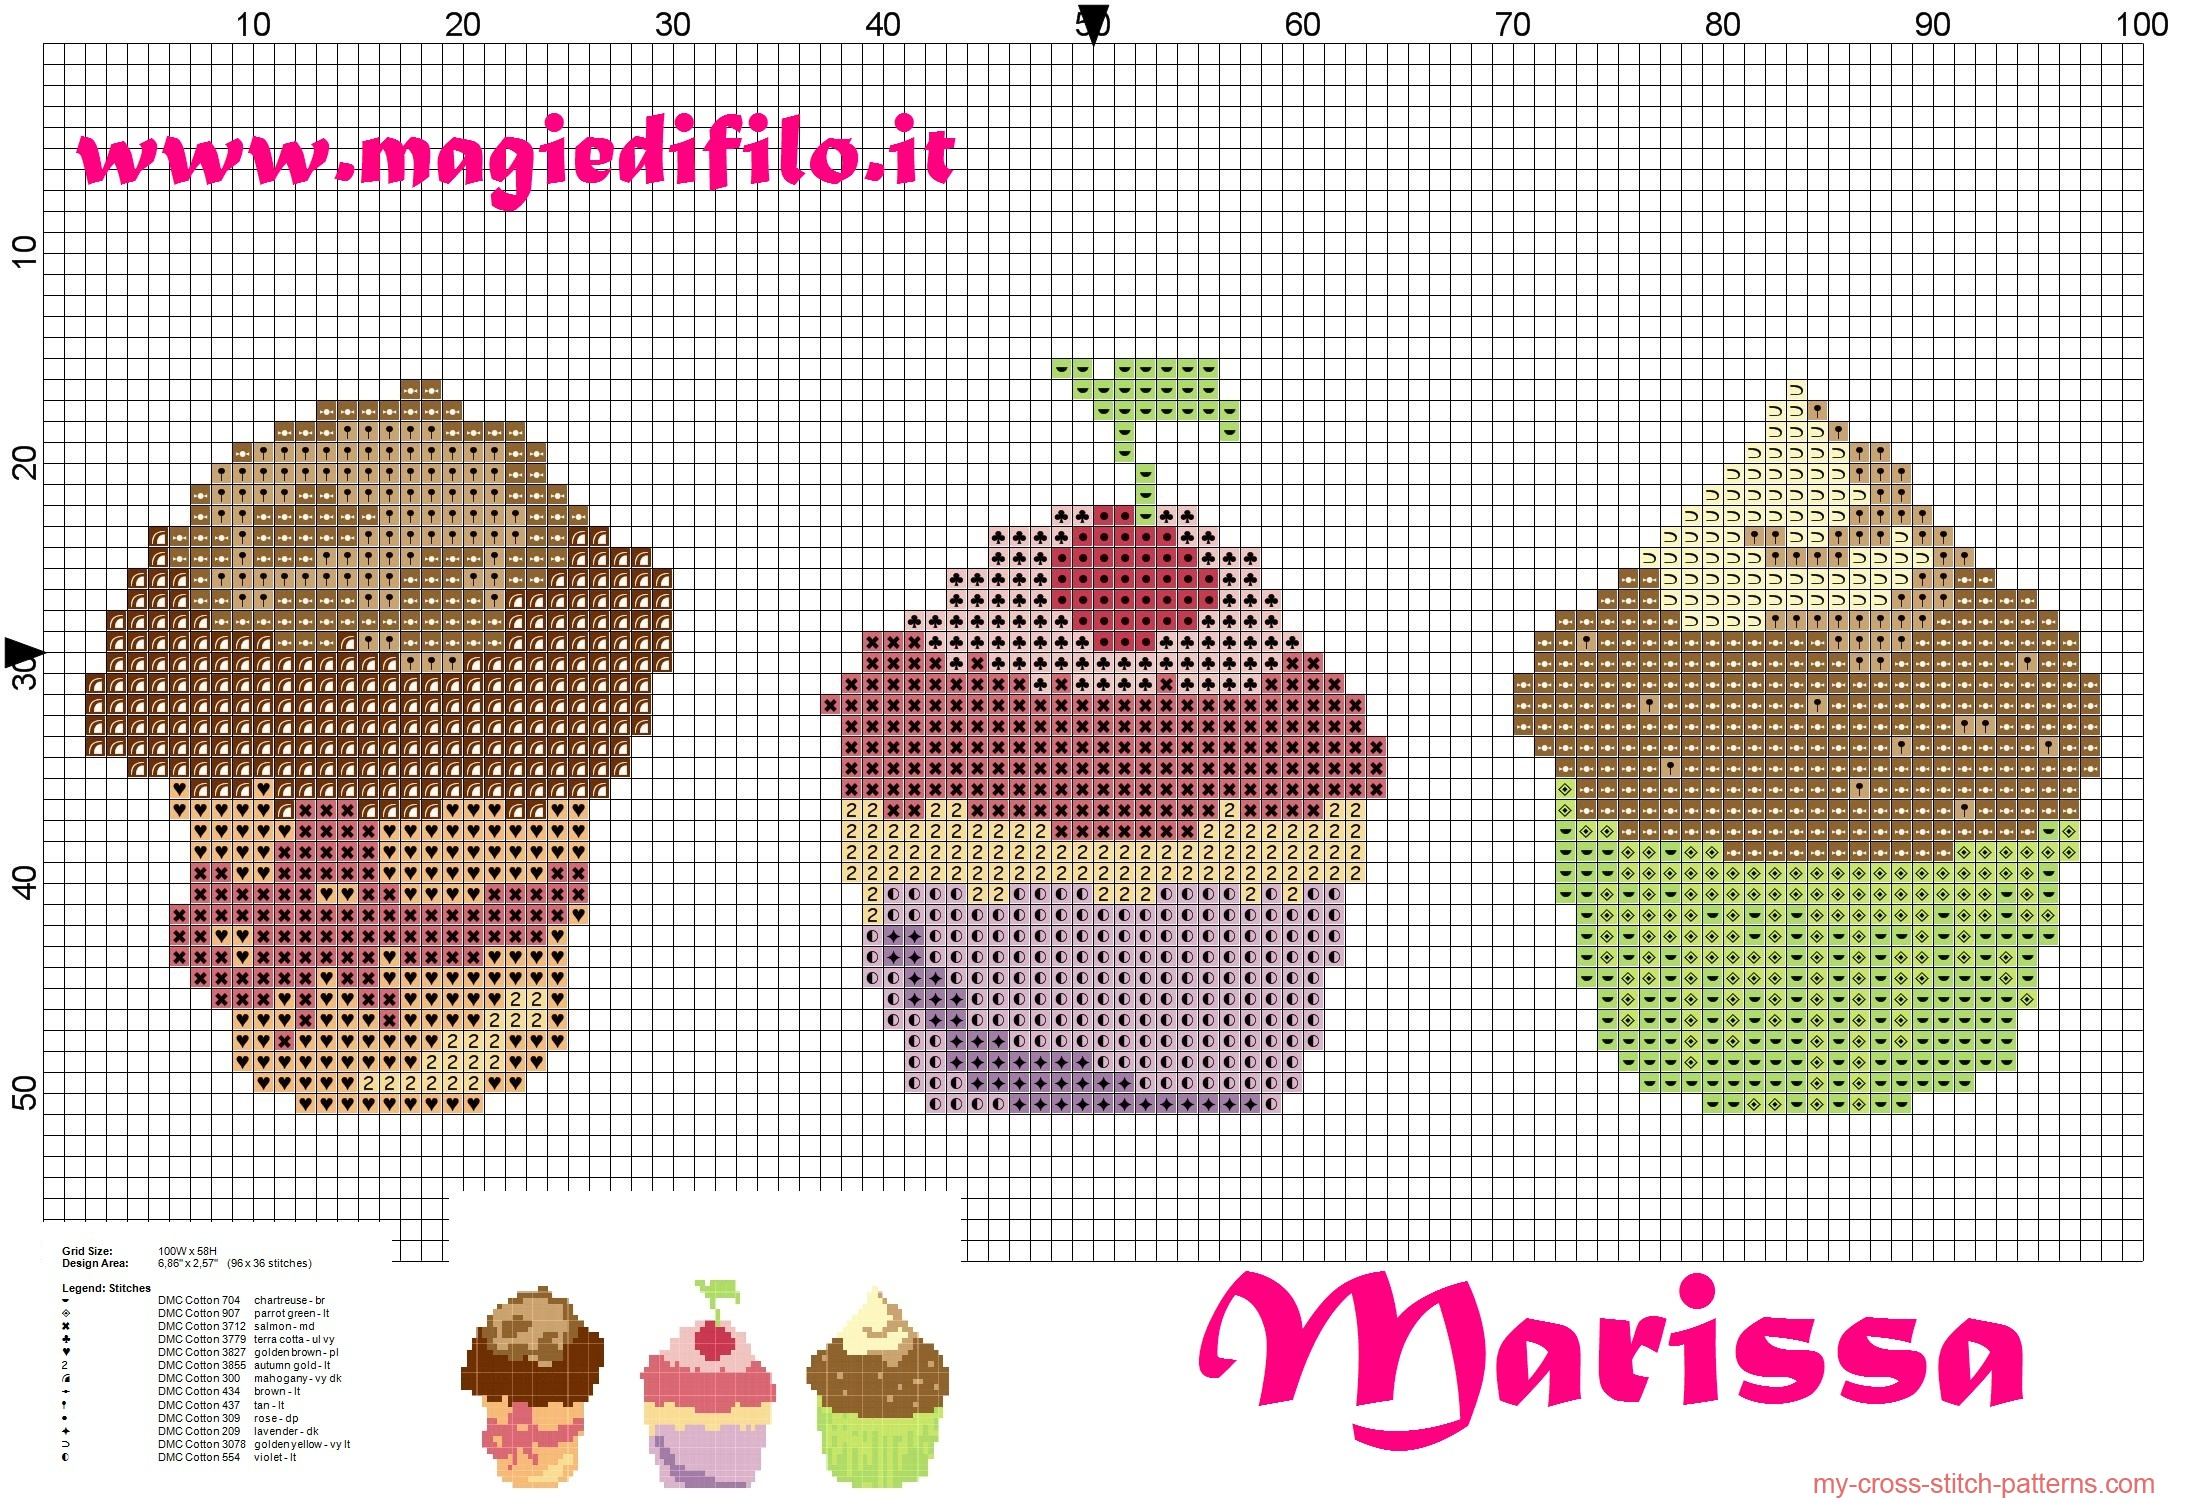 cupcakes_border